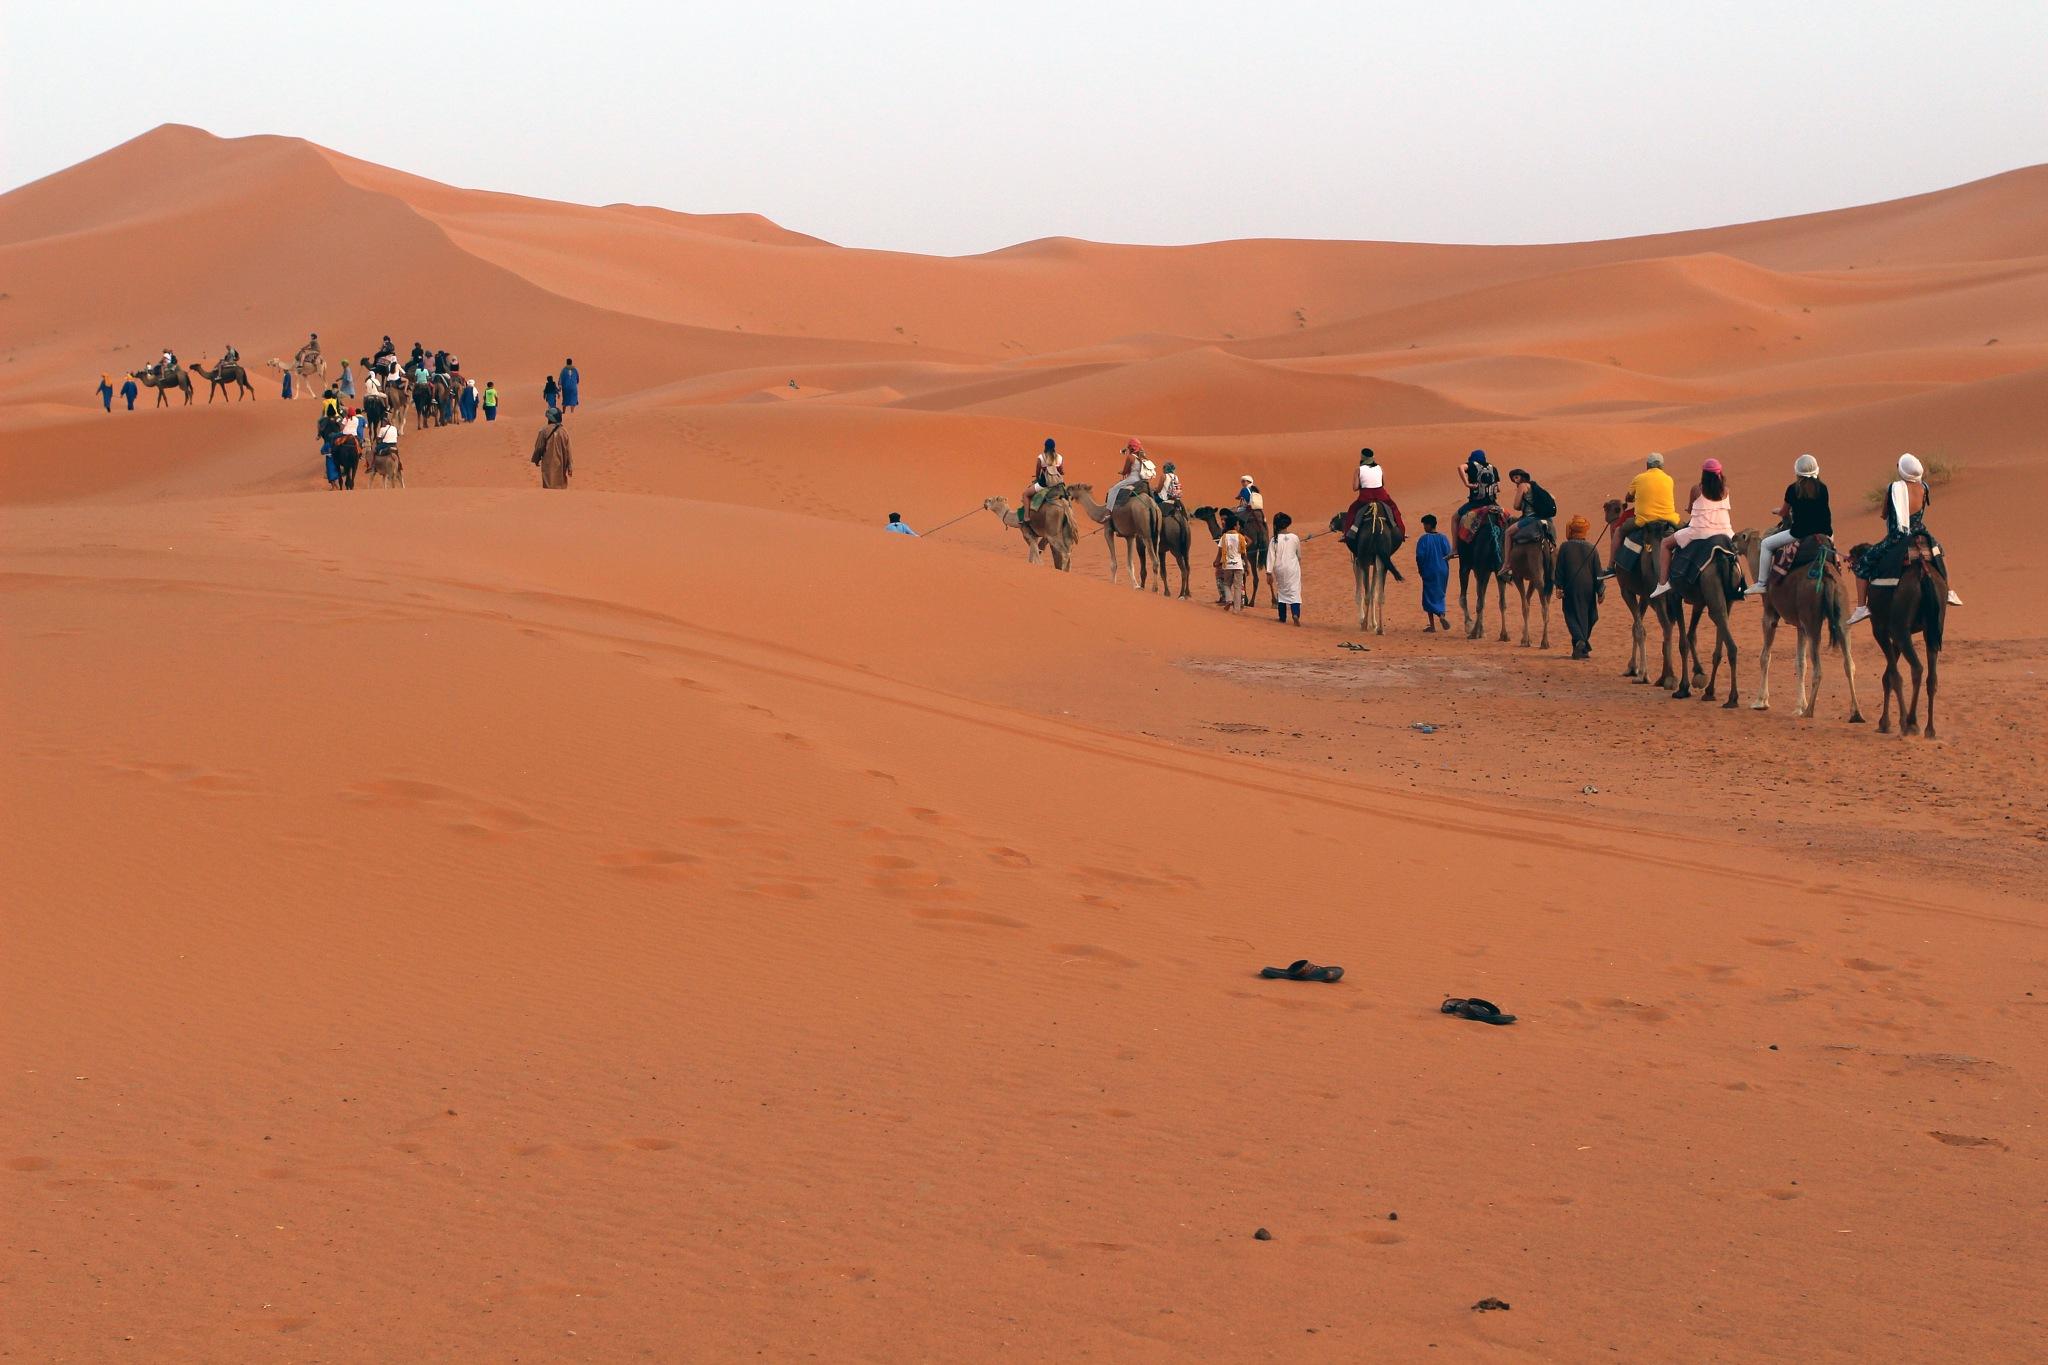 camel caravans by BlackMagicWoman